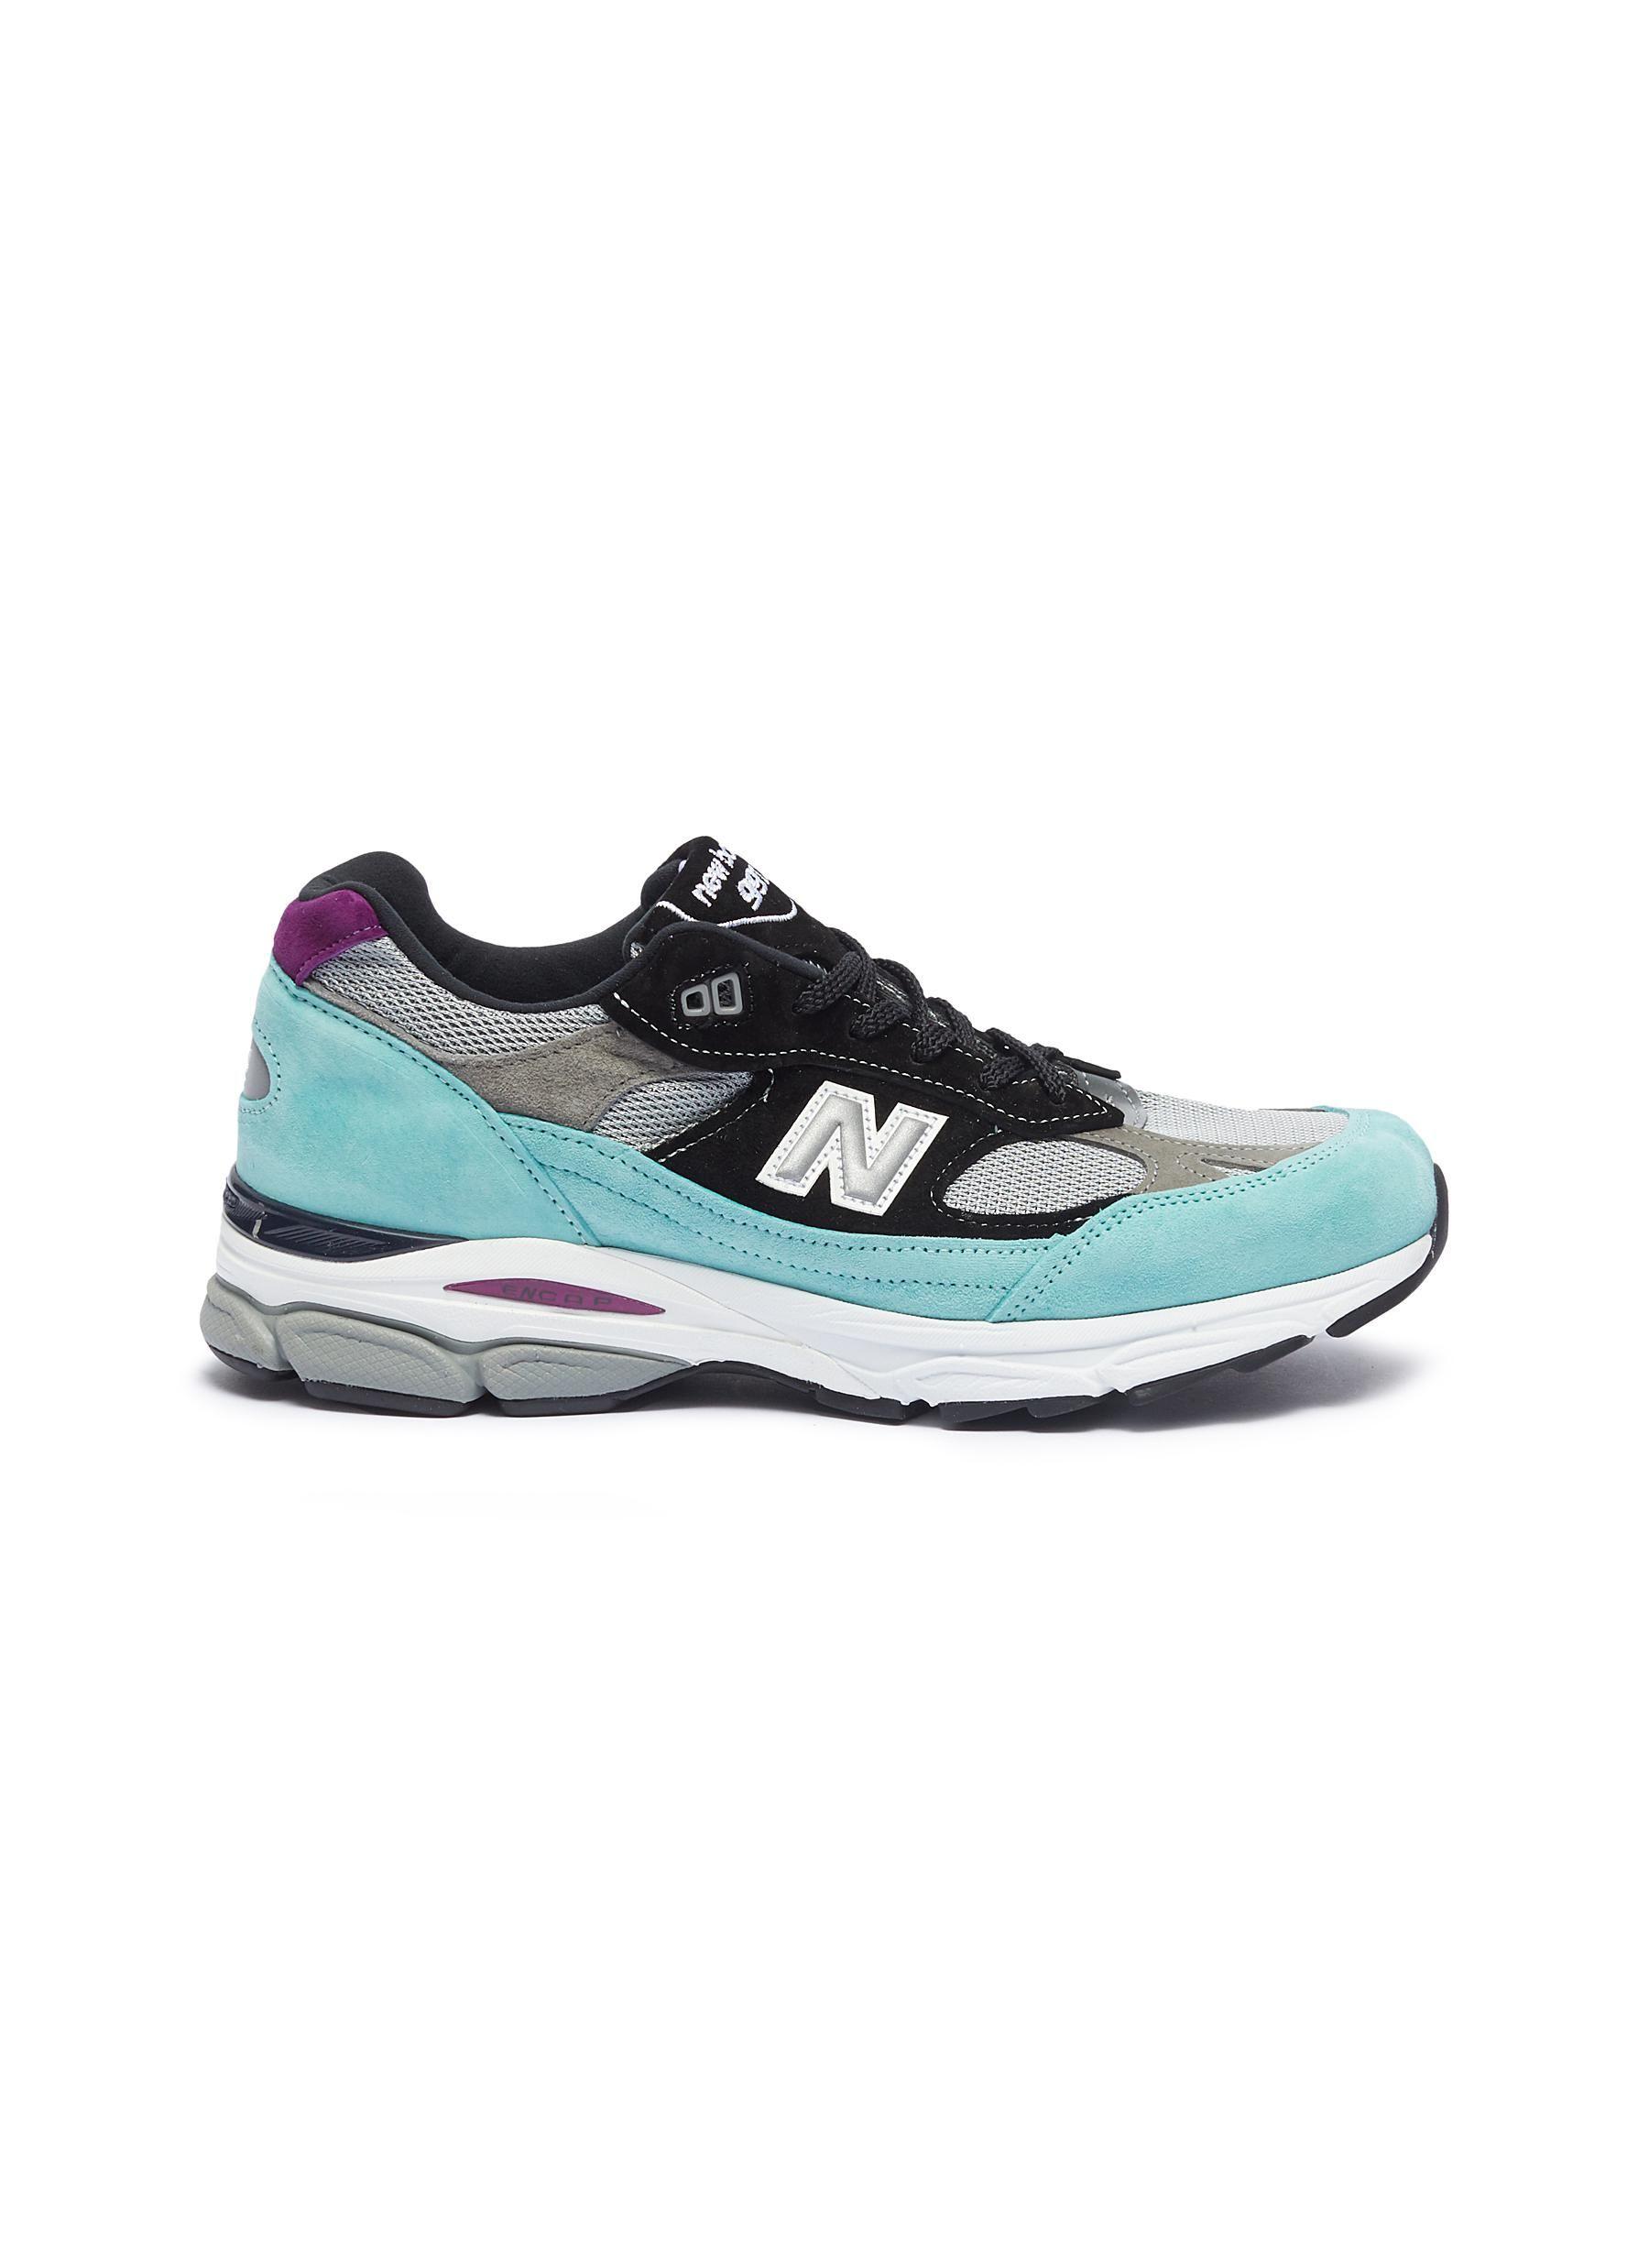 New Balance 'm9919' Colourblock Patchwork Sneakers ModeSens